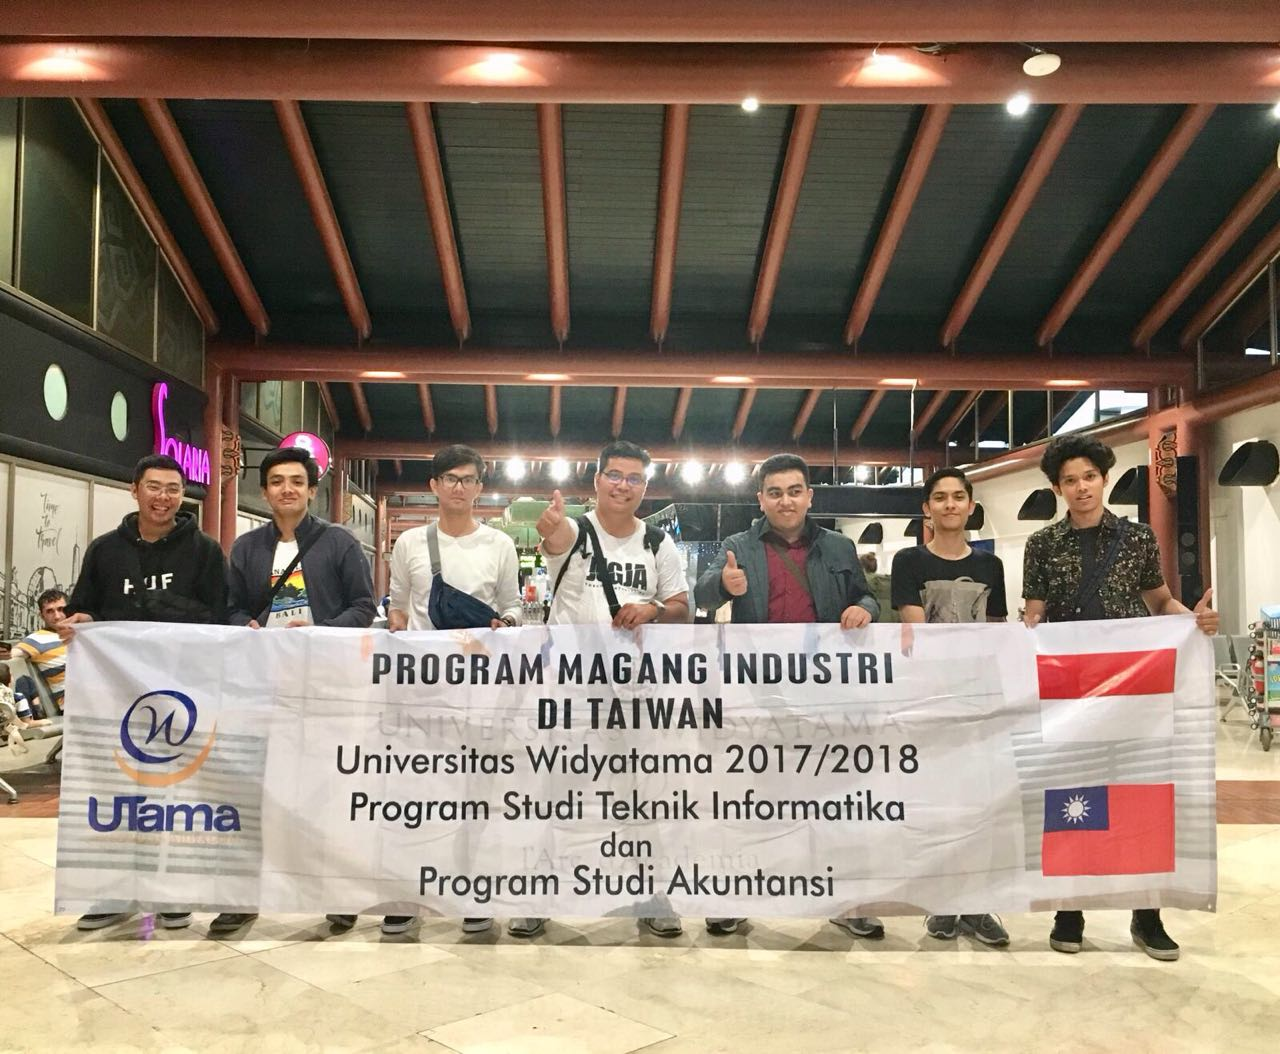 Lebih dari 20 Mahasiswa Universitas Widyatama Mengikuti Program Study Abroad dan Internship di Taiwan